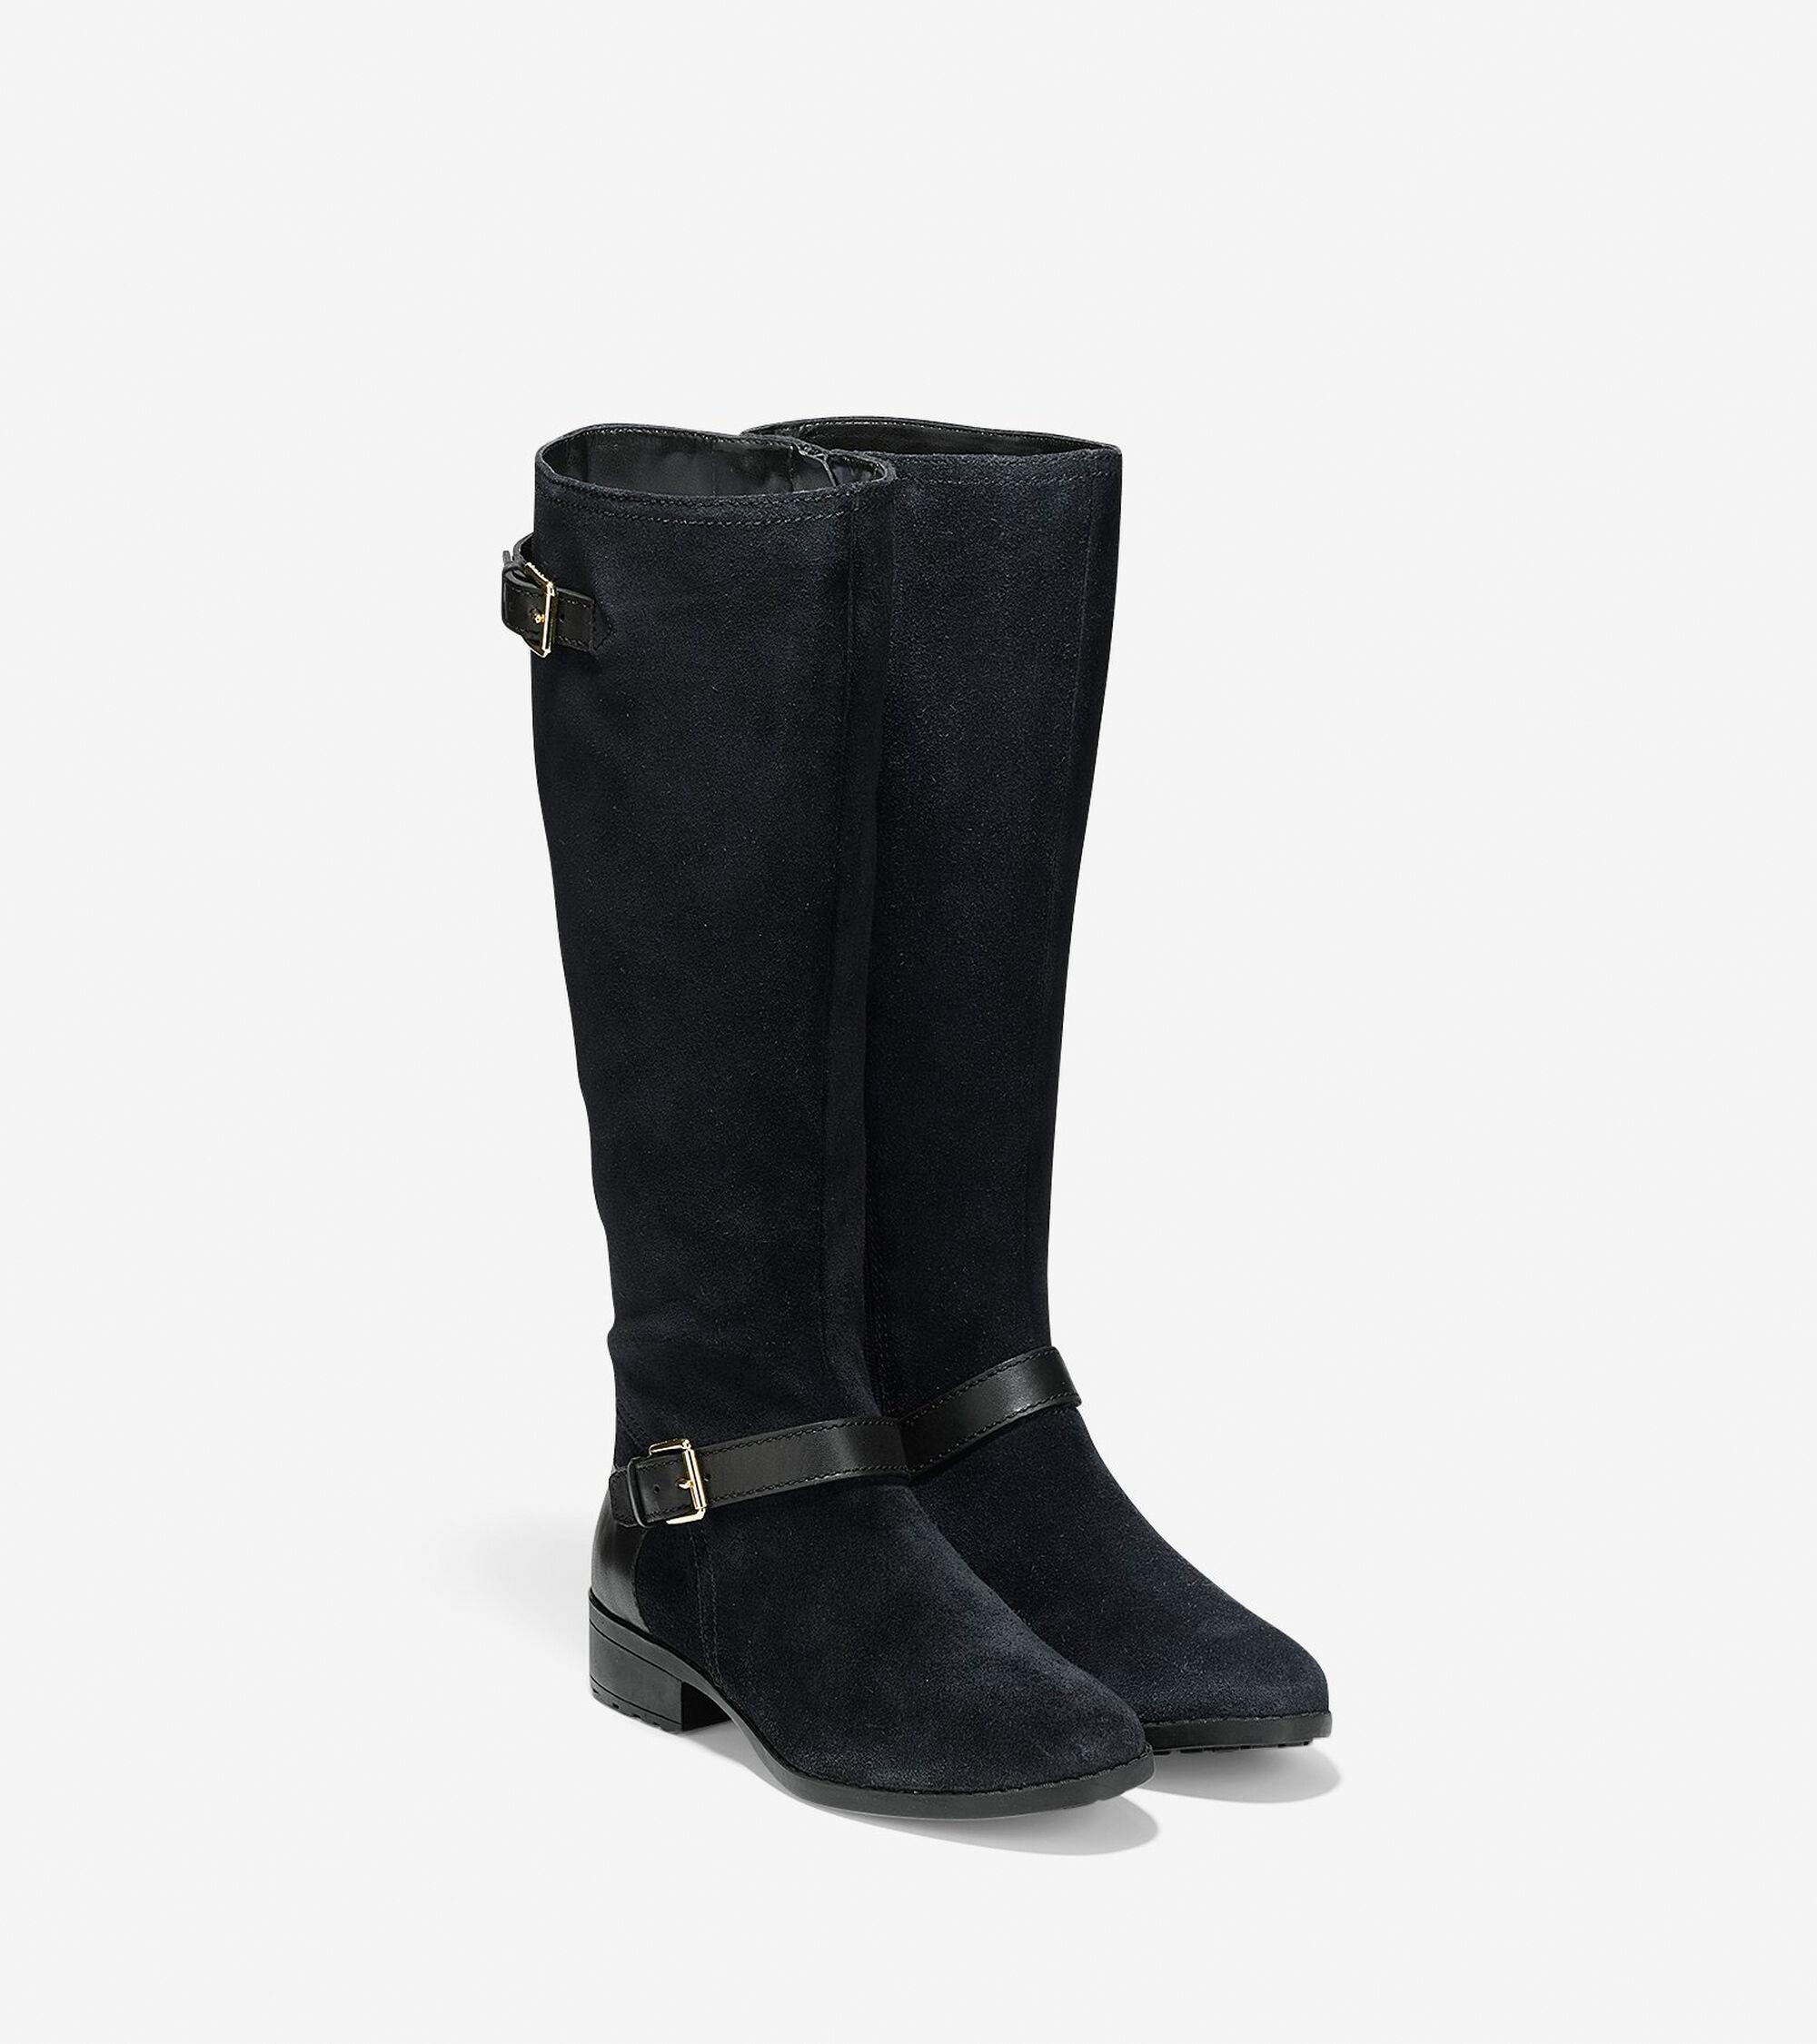 Marla Waterproof Tall Boots 30mm in Black | Cole Haan